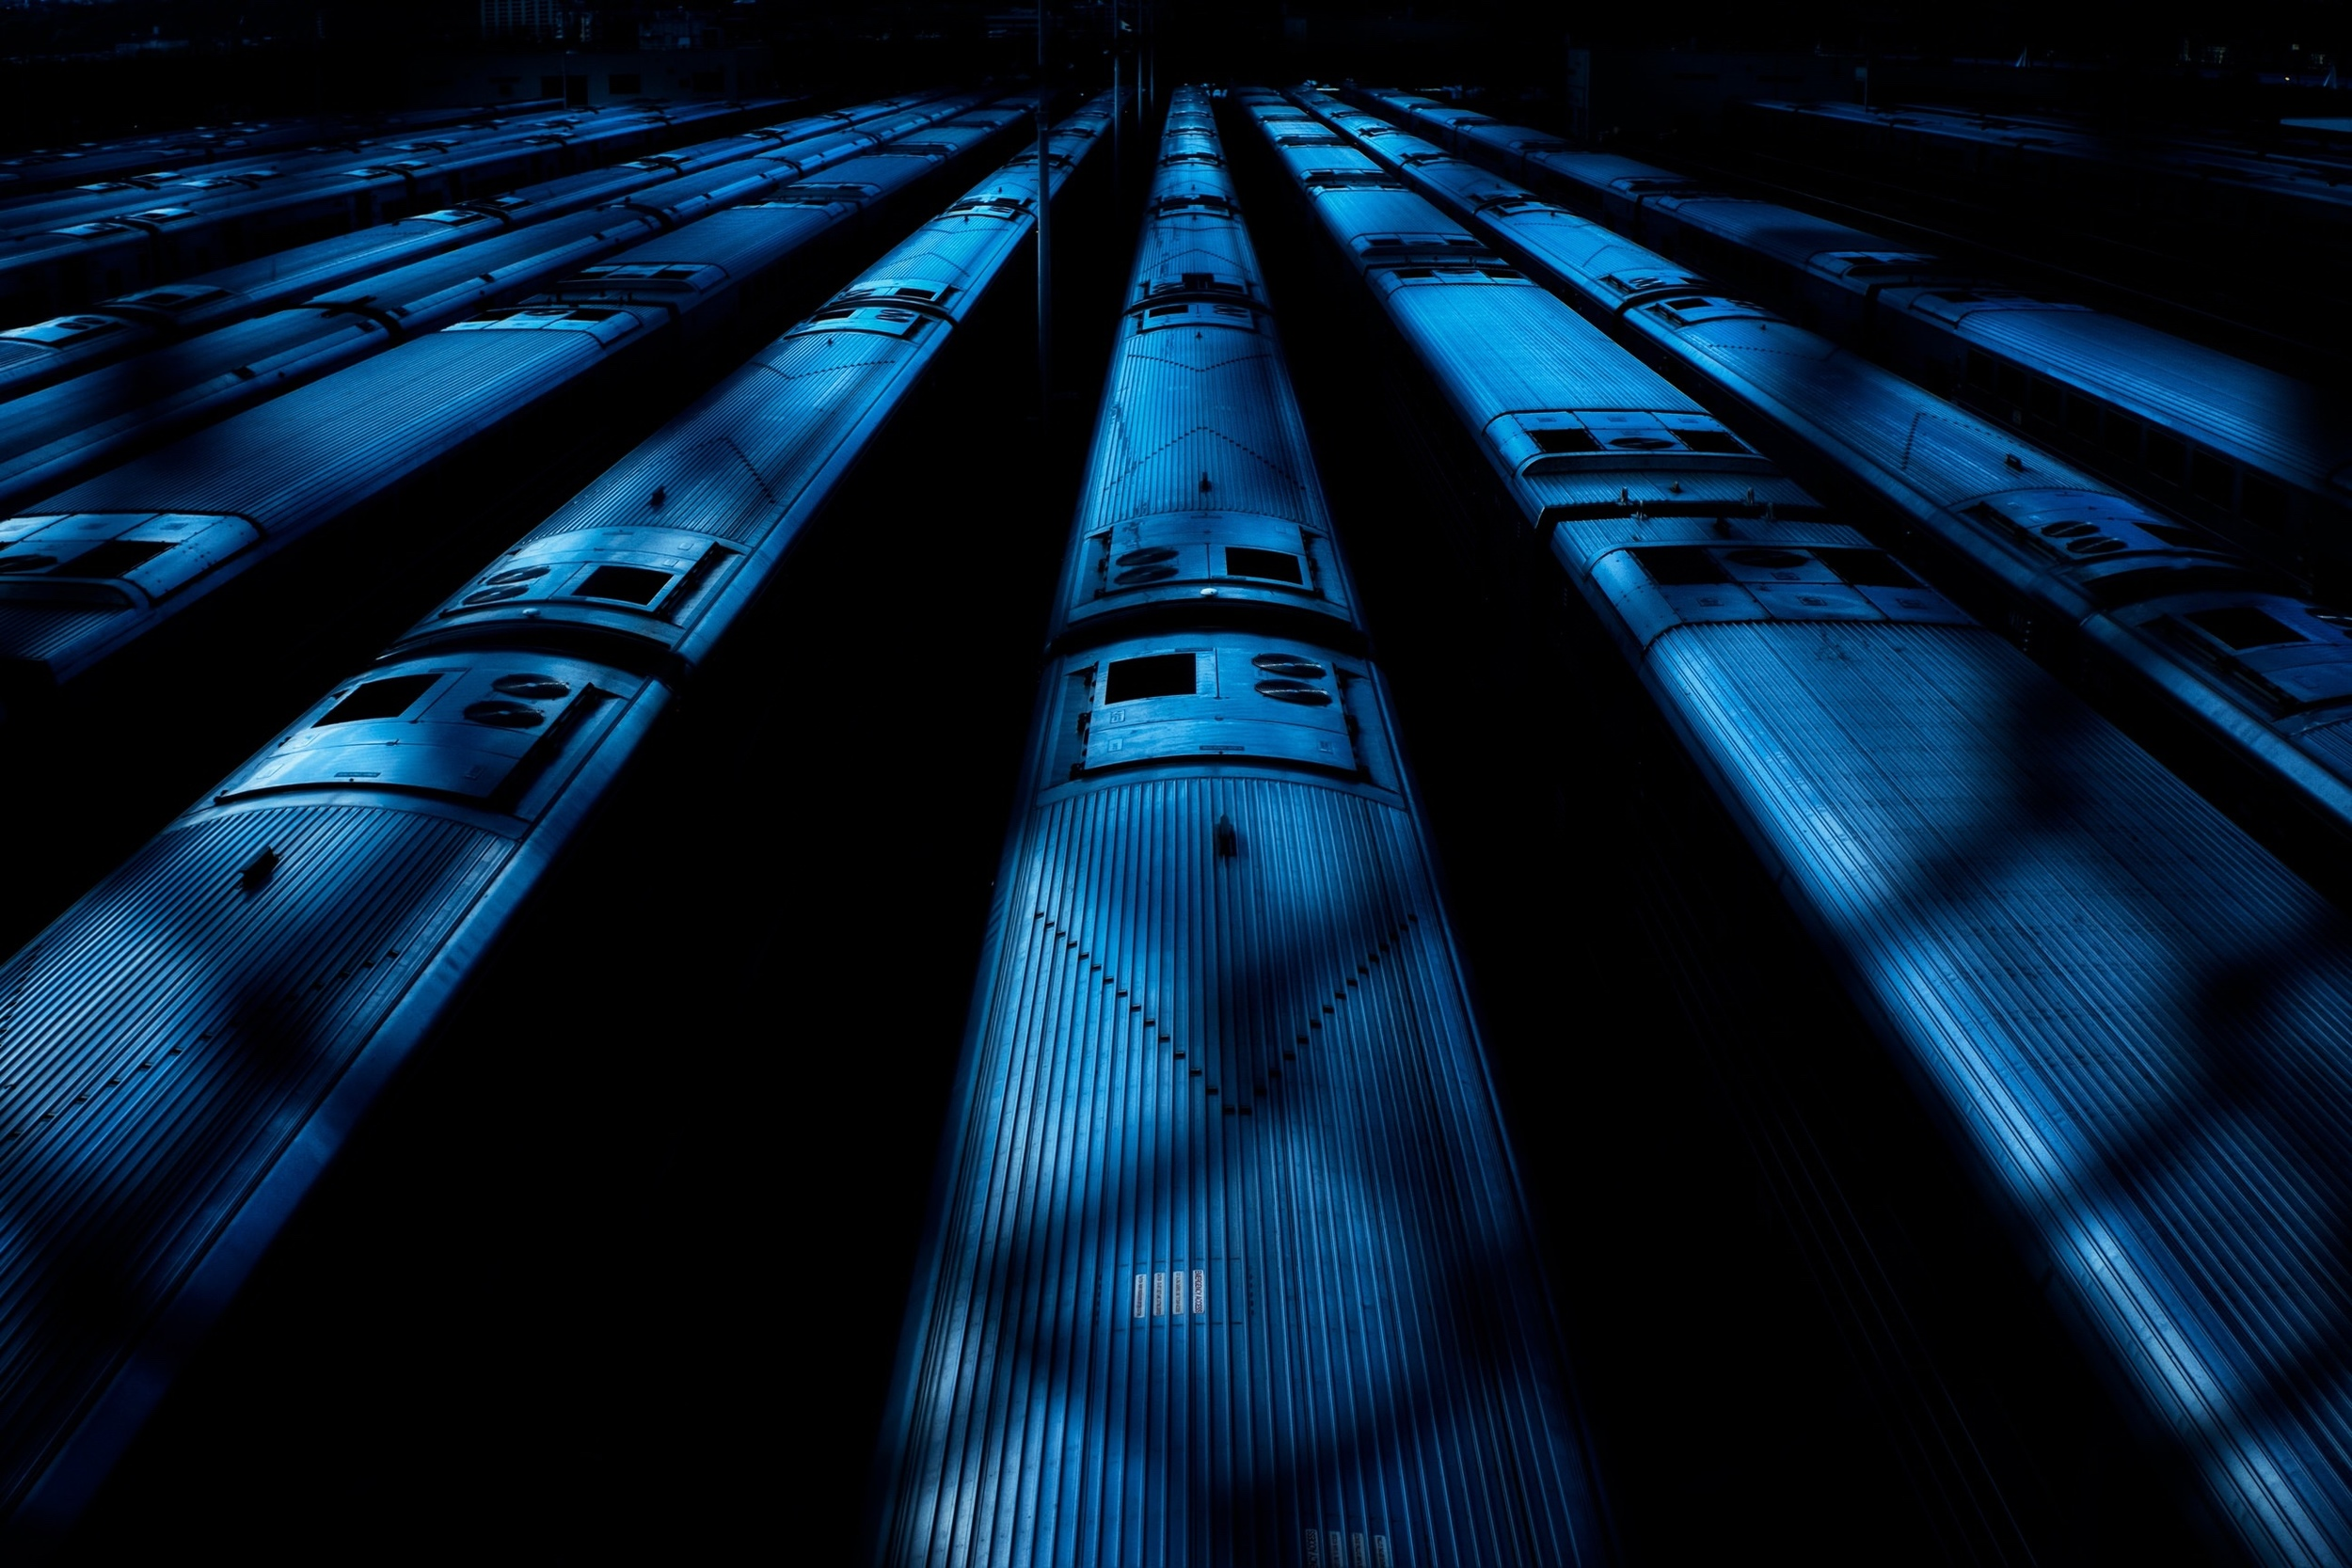 hudson-yards-trains-sleeping-at-night.jpg